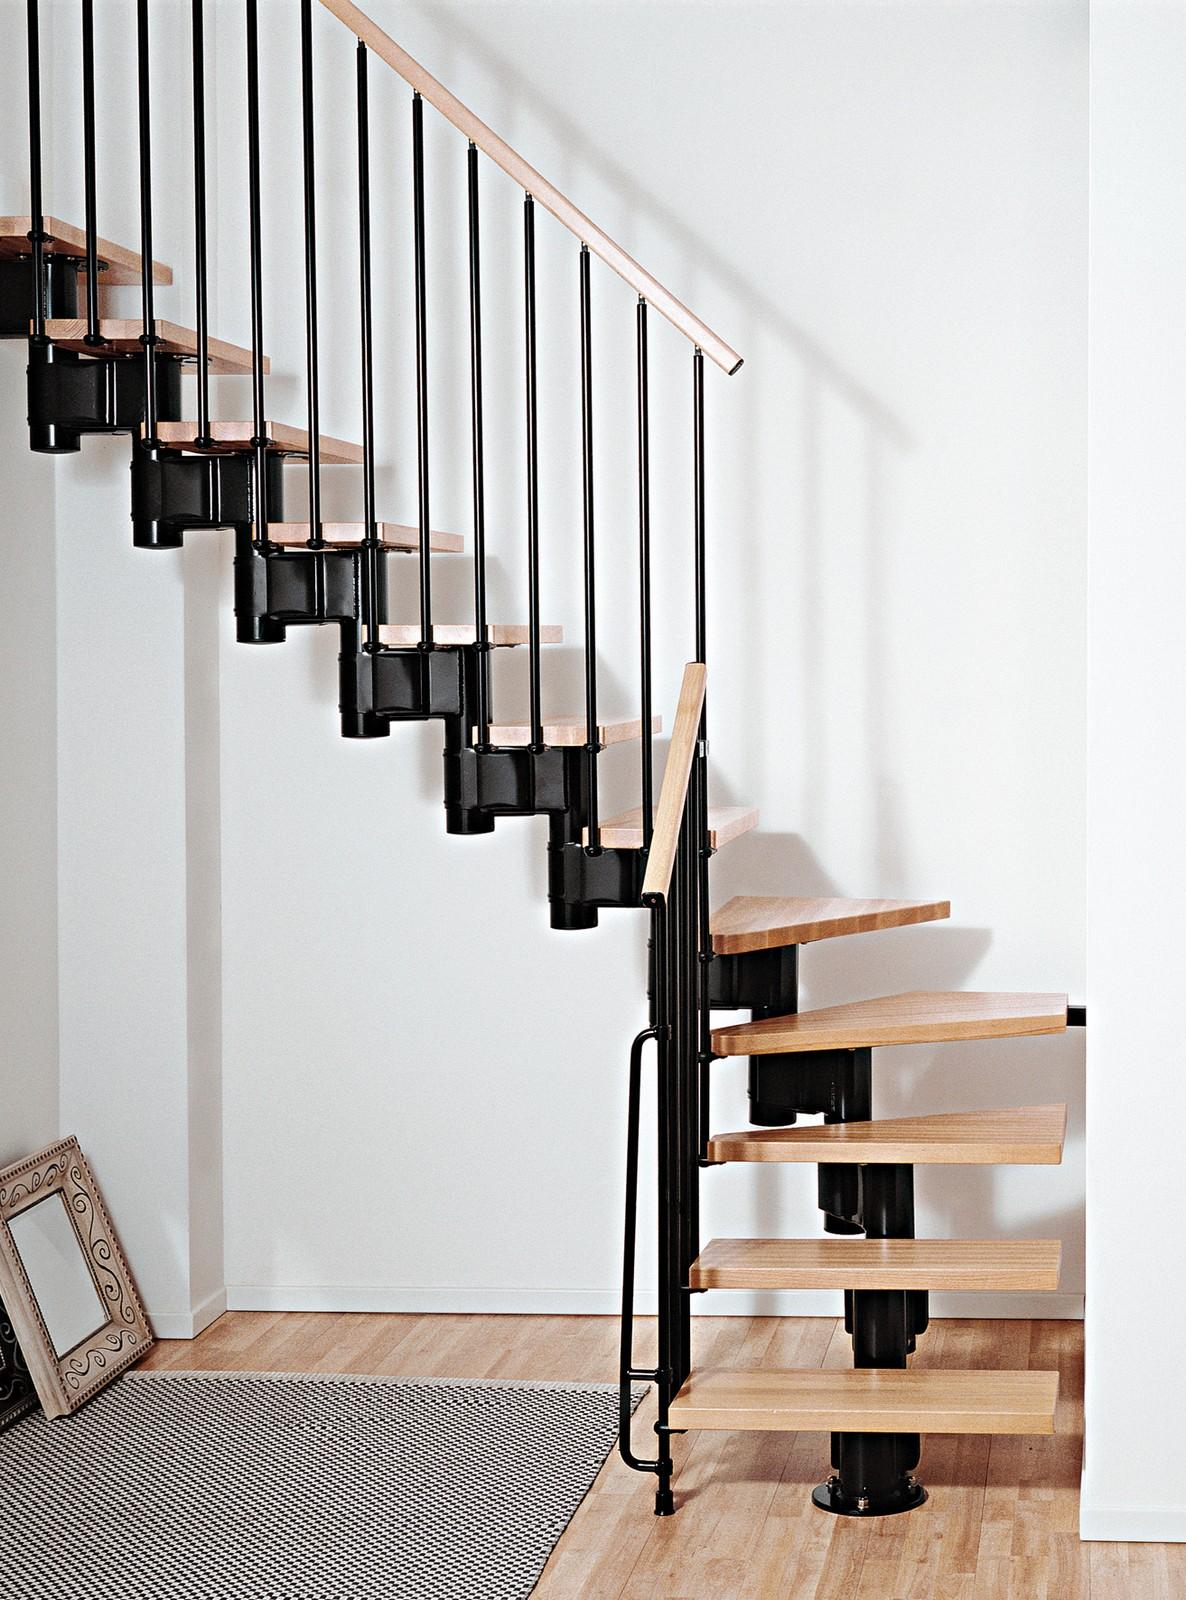 kompact adjustable staircase kit metal steel and wood spiral staircase fontanot